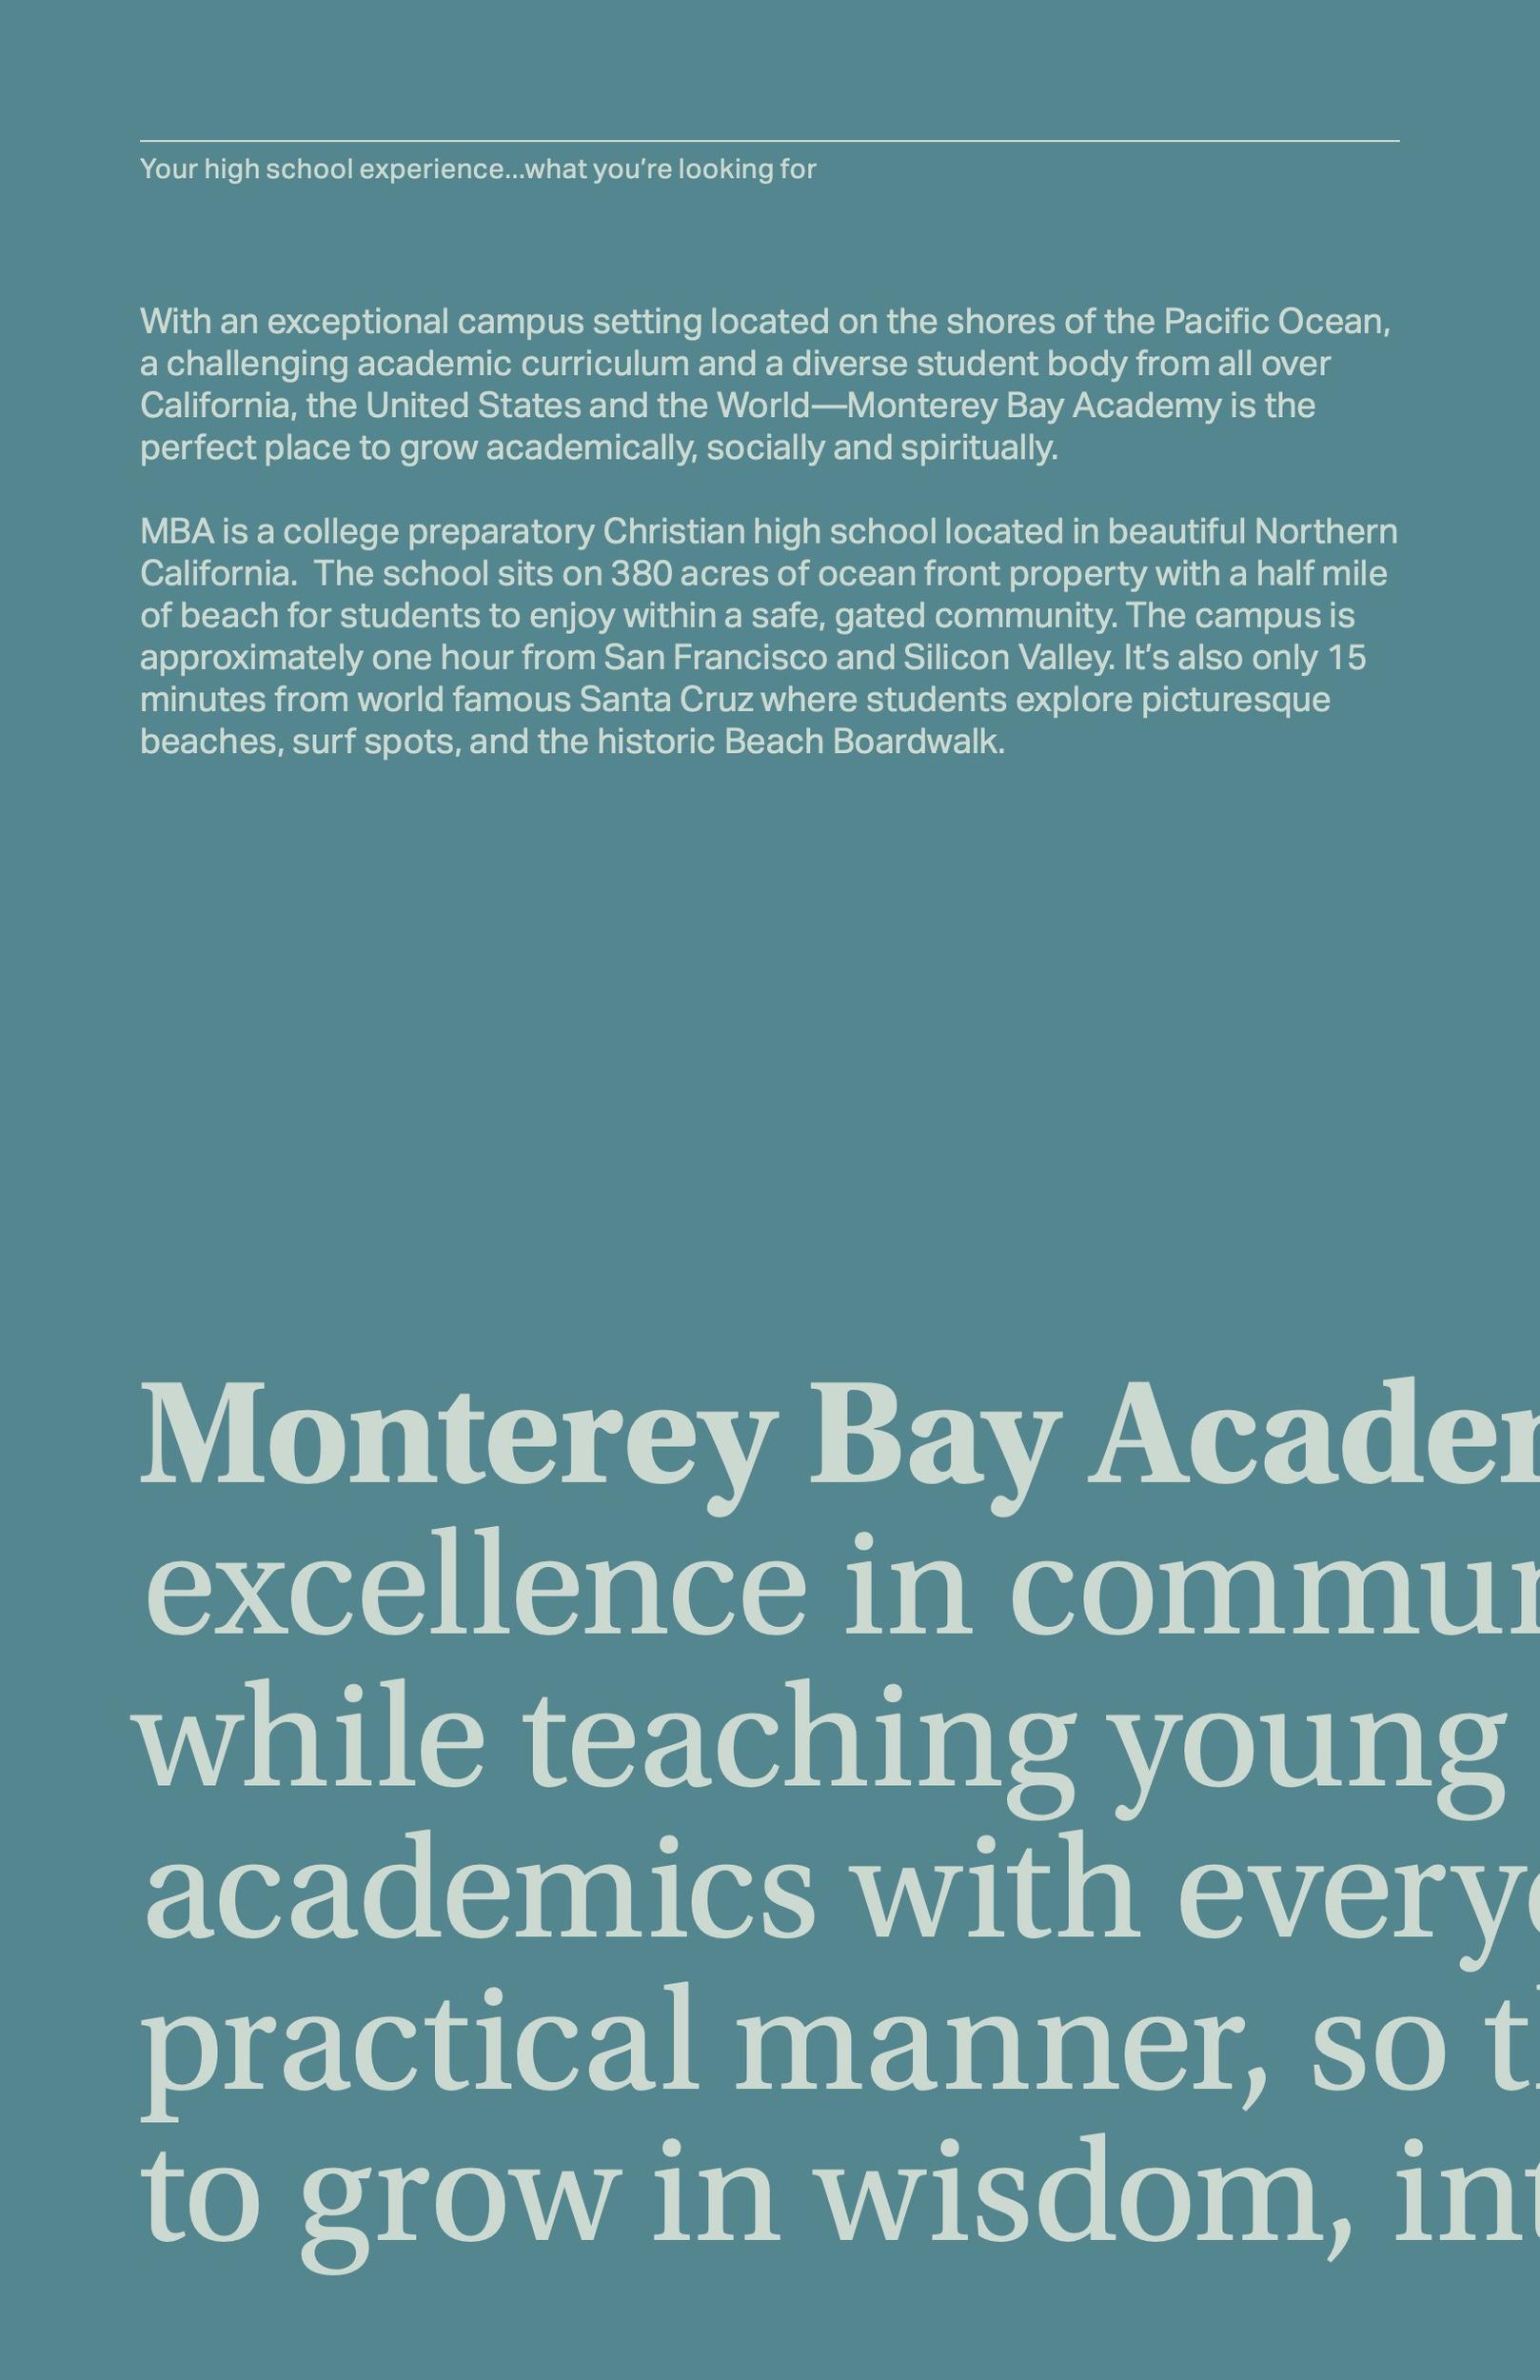 MBA_Brochure_2018-02.jpg